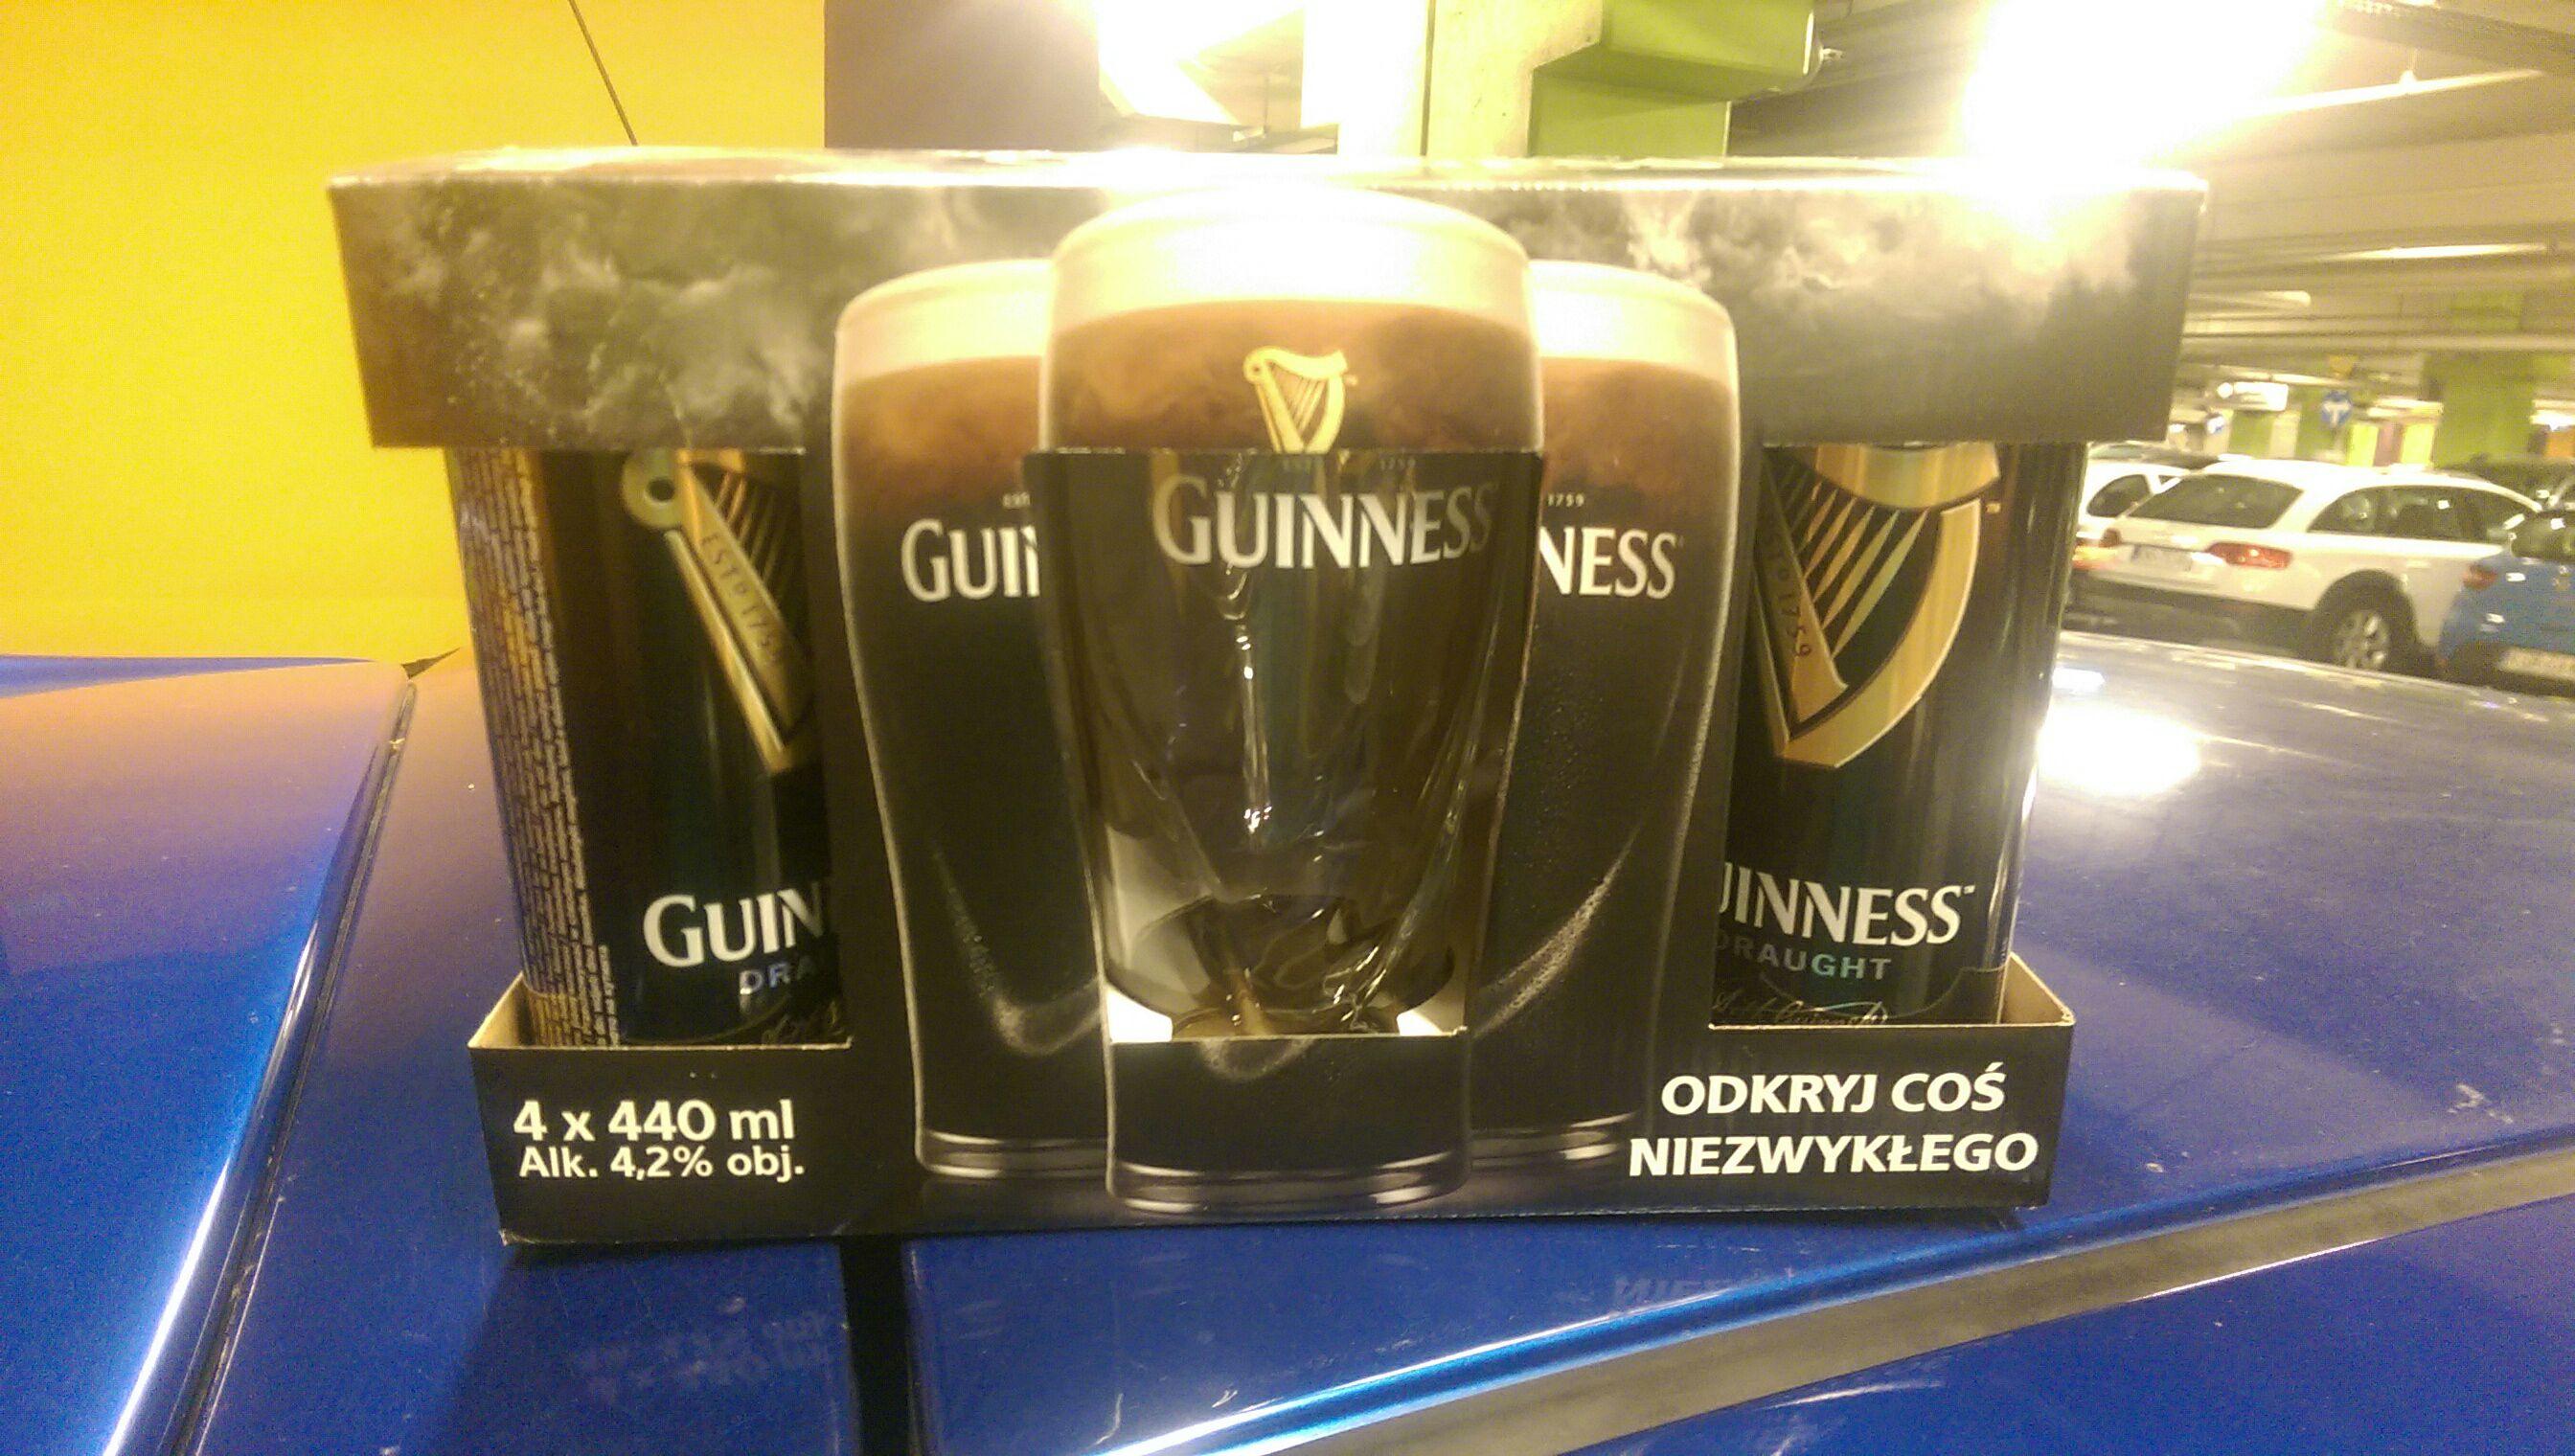 4 Guinness + szklanka za 9.99!